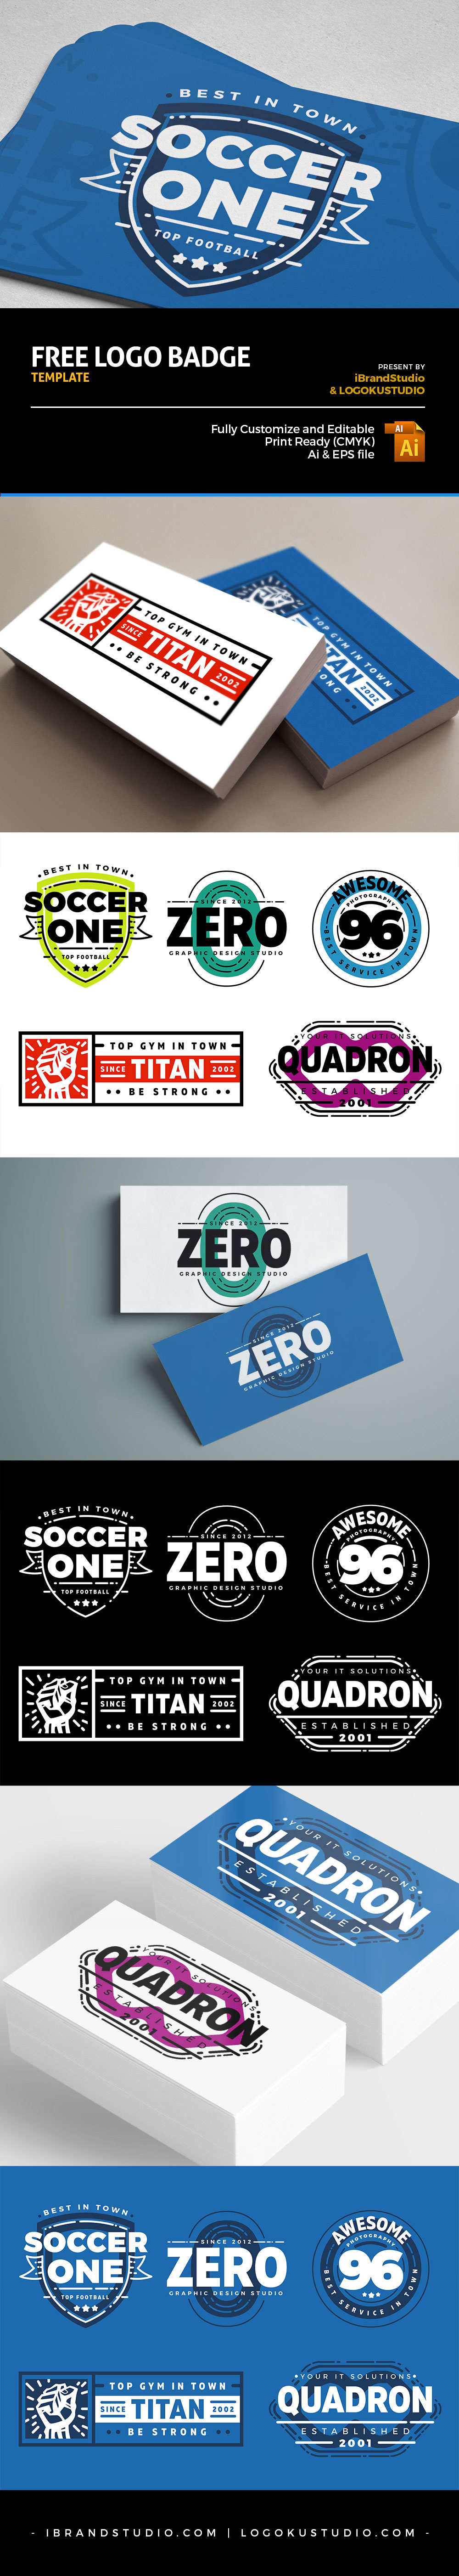 Free Retro Logo Badges